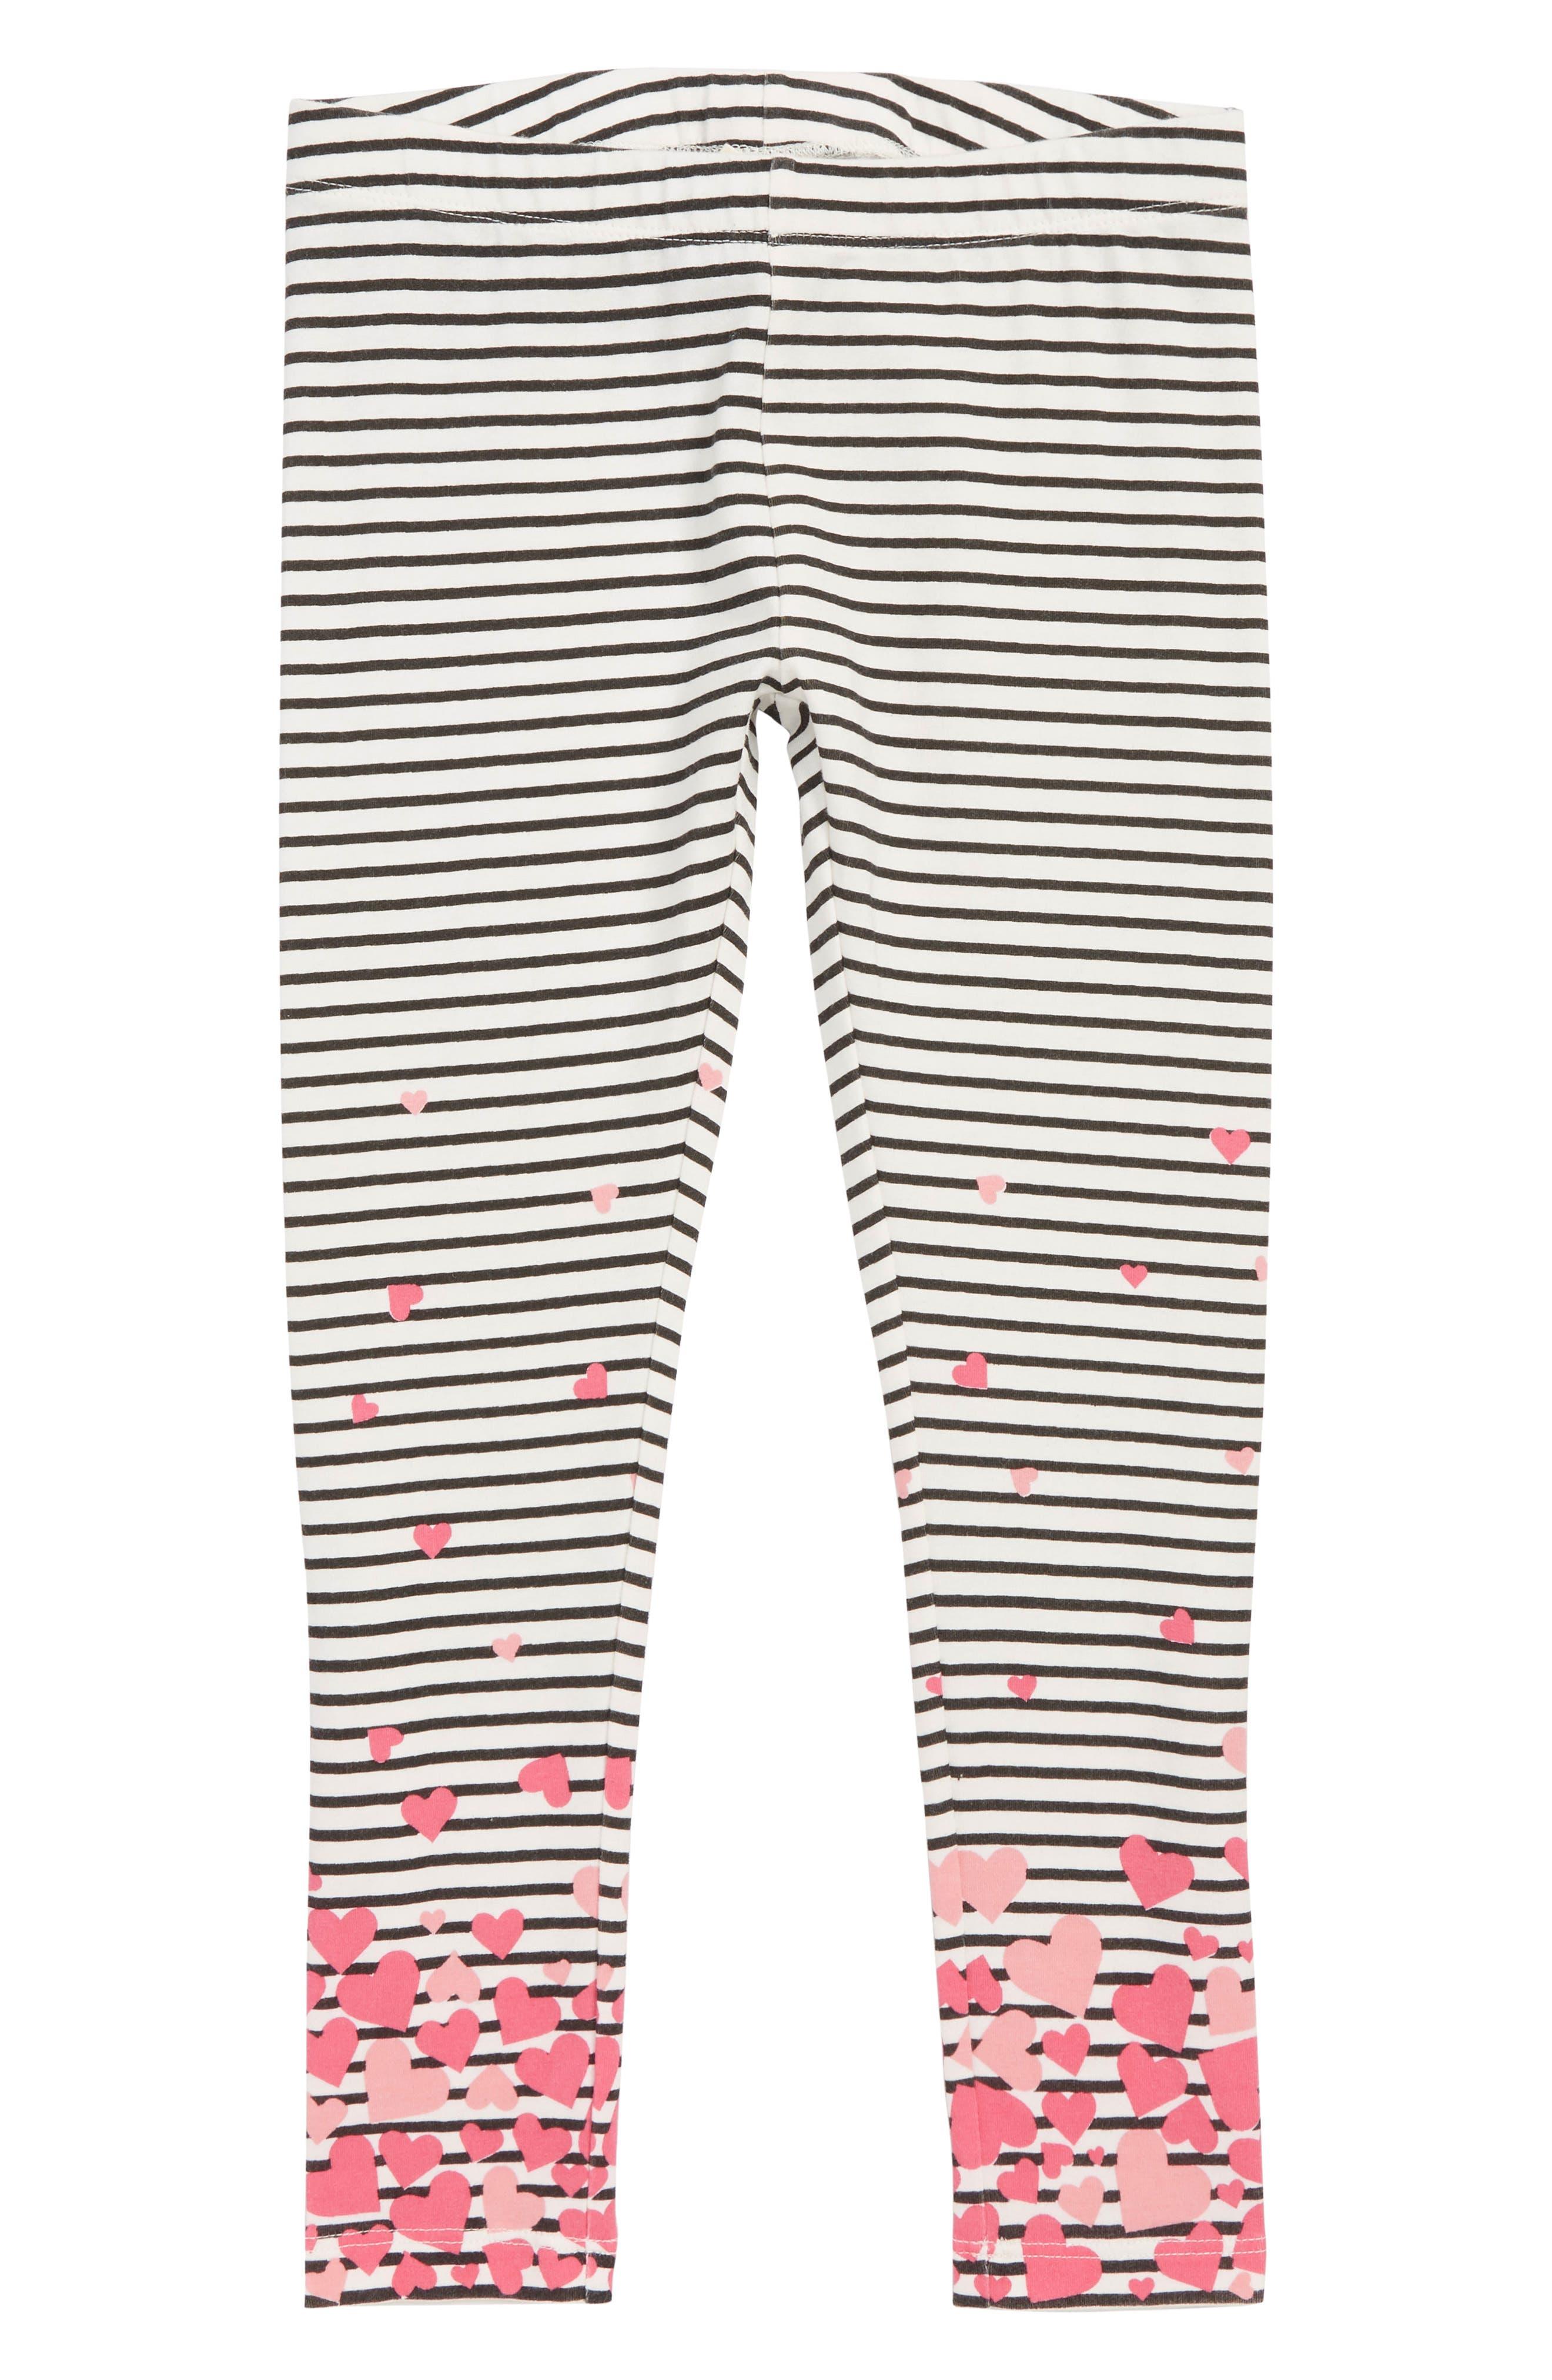 Girls Tucker  Tate Striped Graphic Leggings Size 4  Ivory